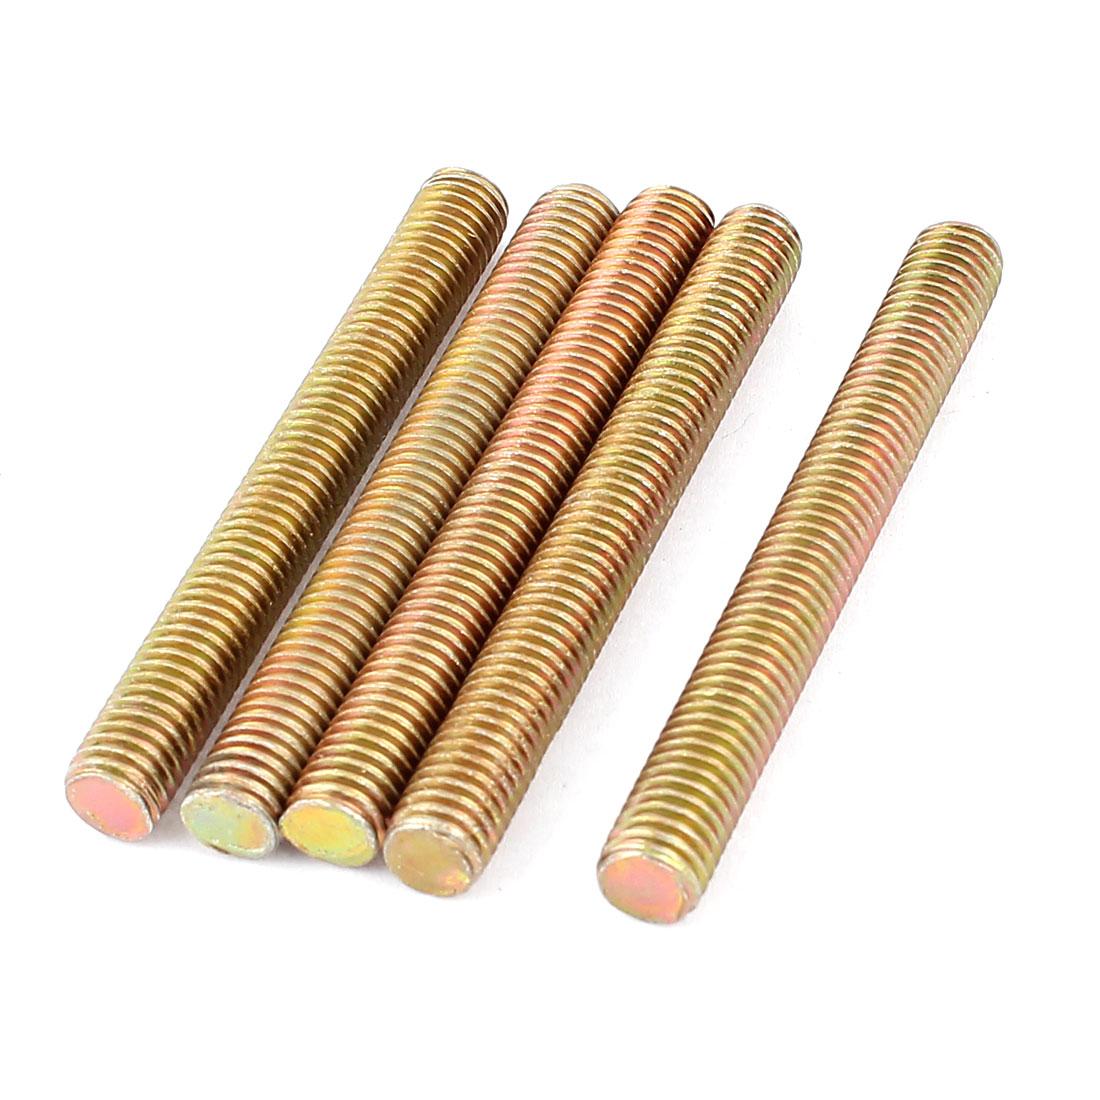 1.25mm Pitch M8 x 70mm Metal Male Threaded Rod Bar Bronze Tone 5 Pcs